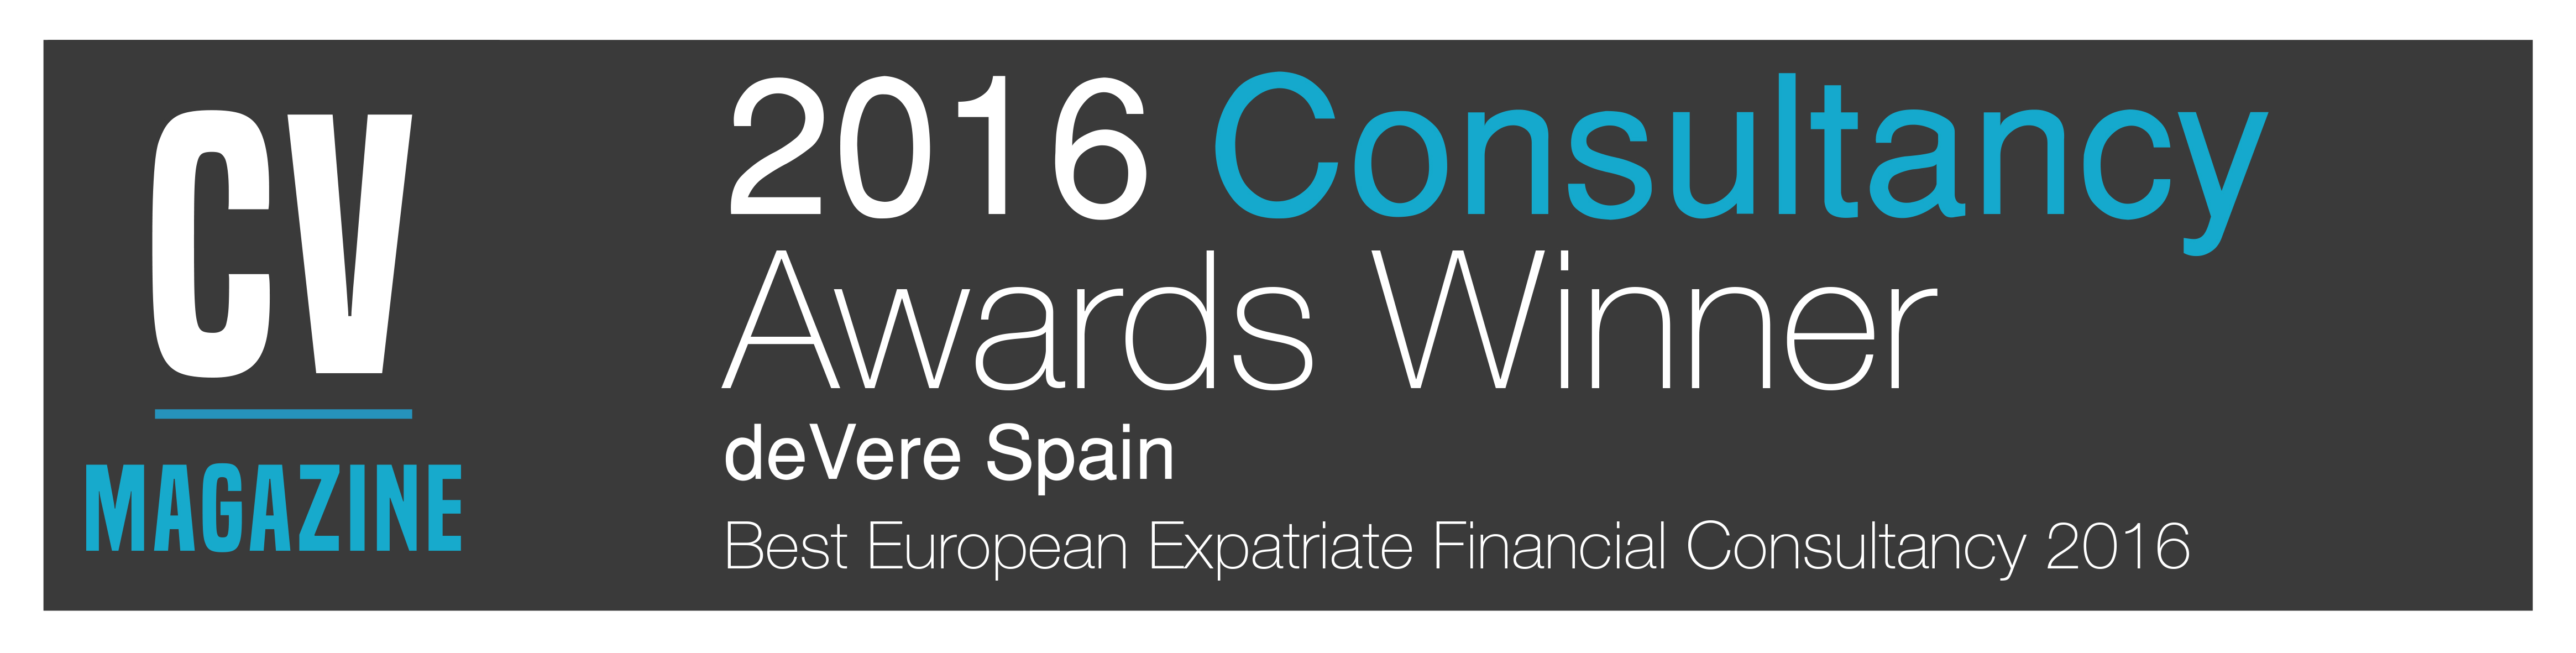 consultancy awards winner